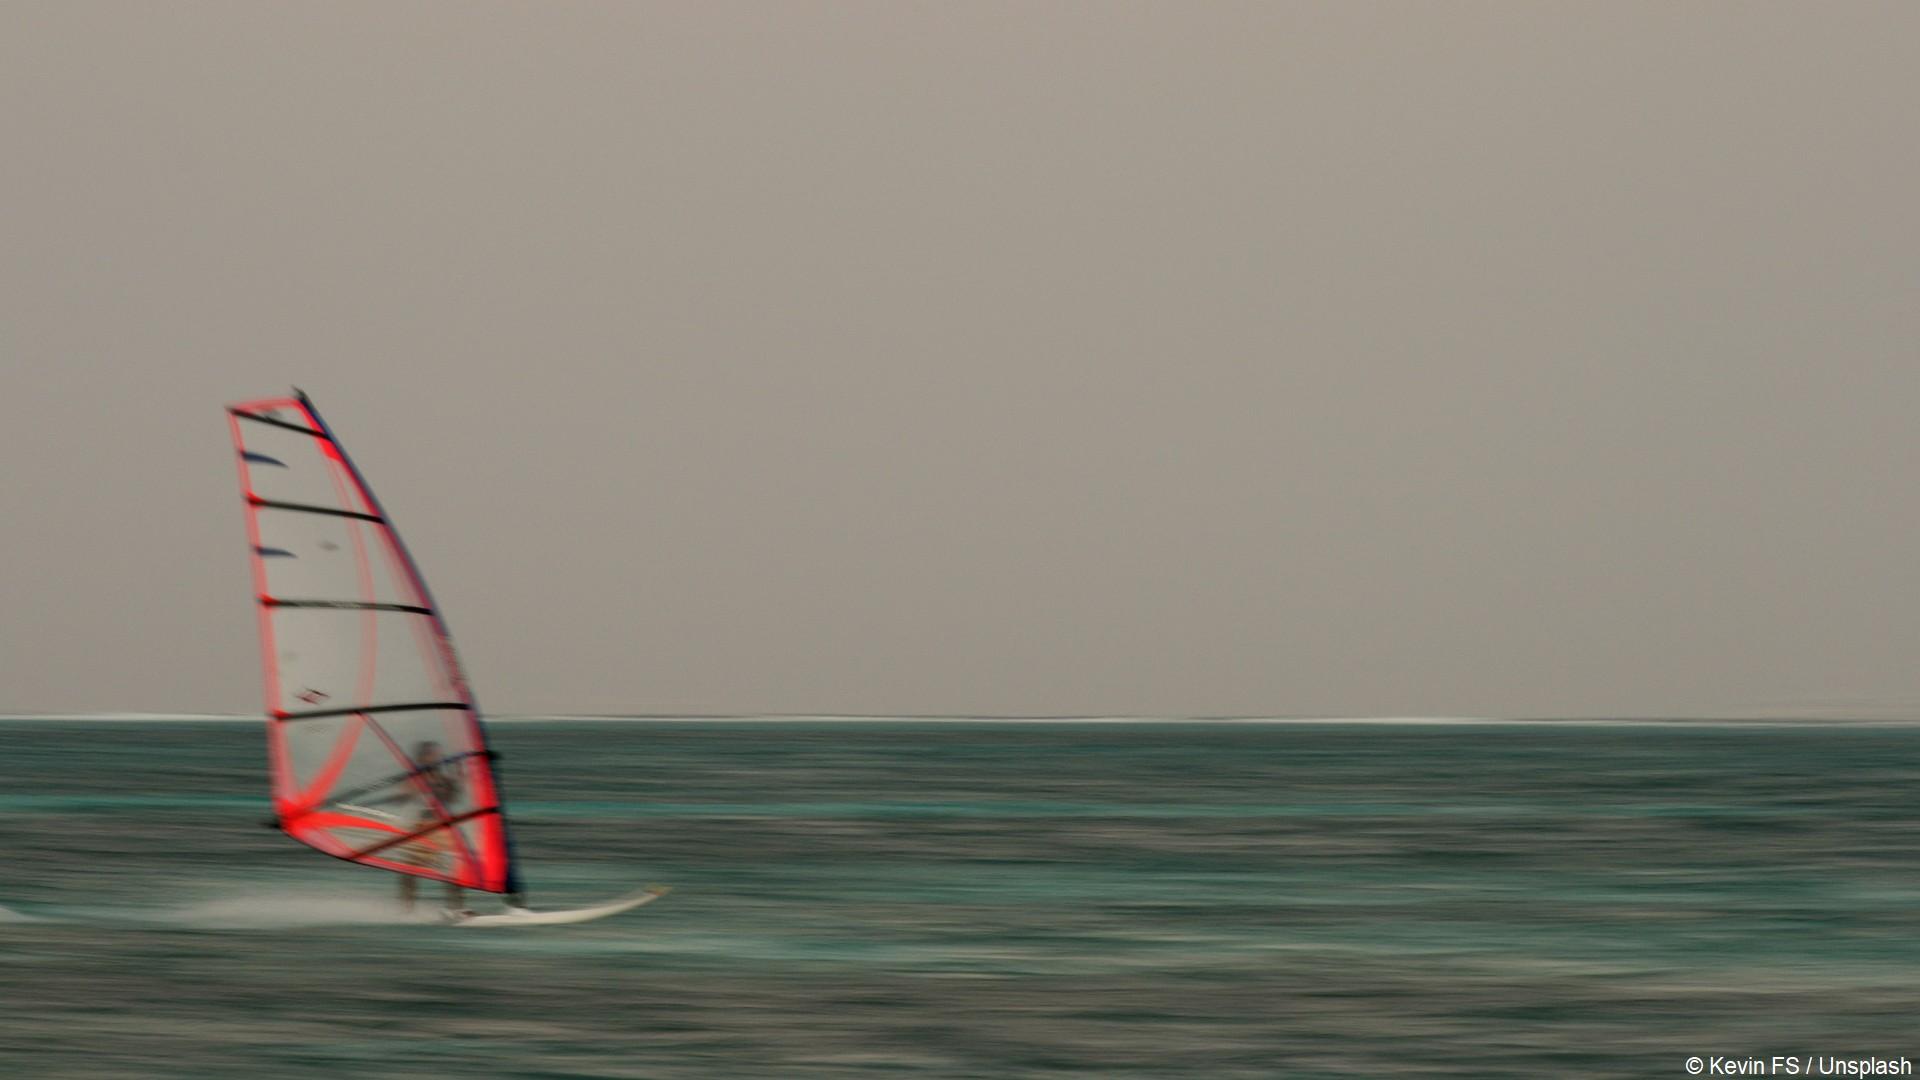 Windsurf (c) Kevin FS Unsplash